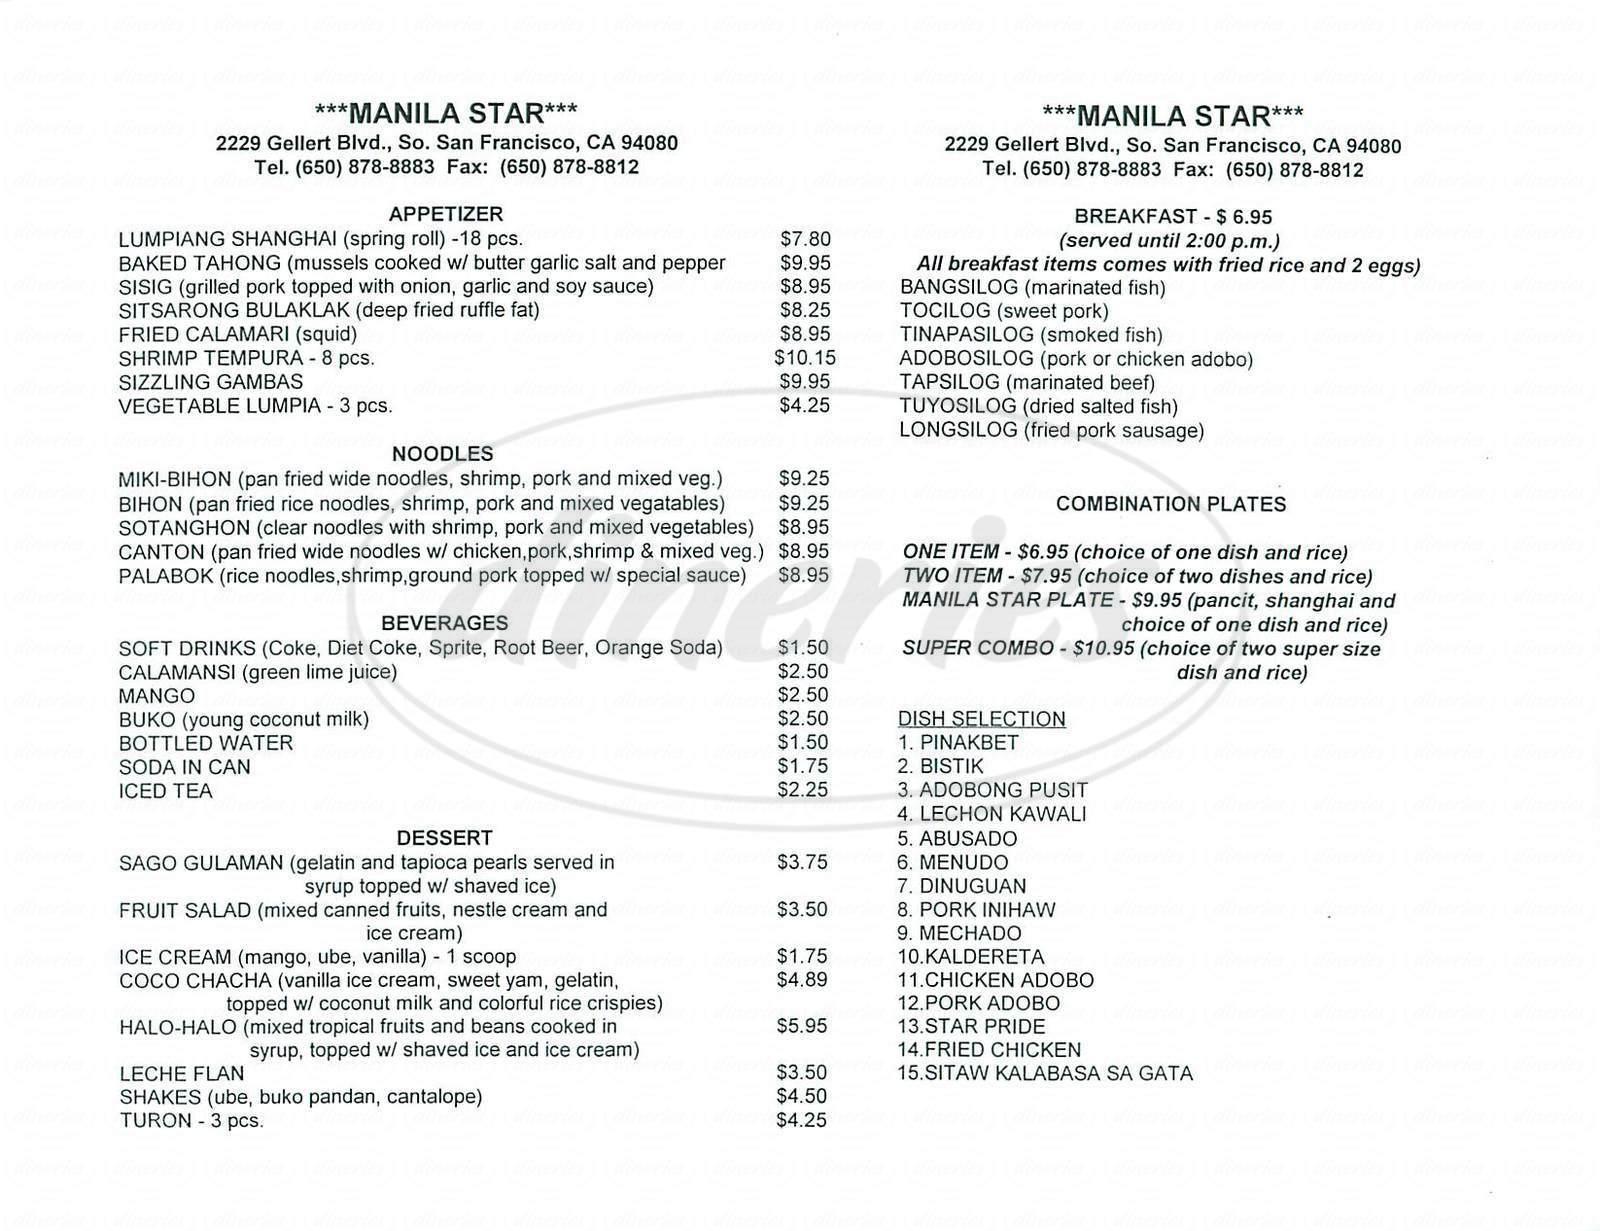 menu for Manila Star Restaurant